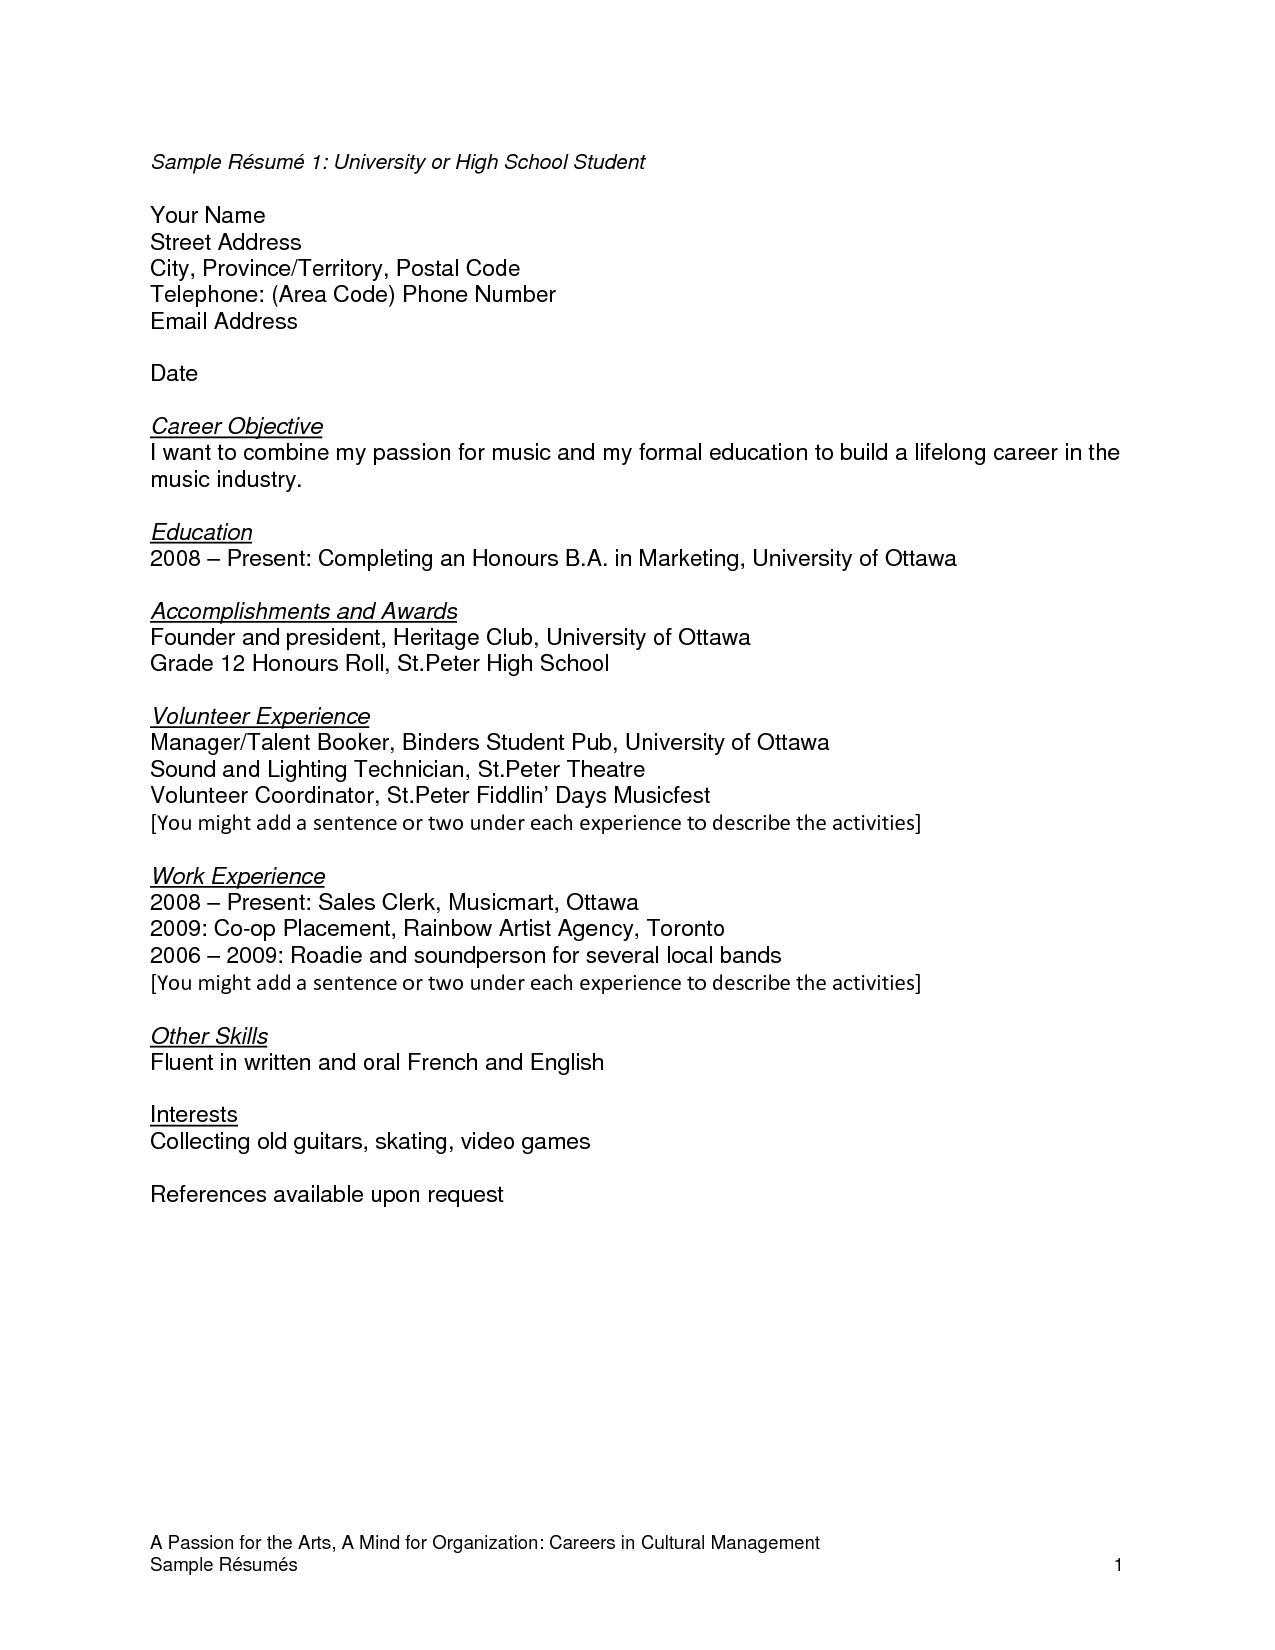 sample of a high school resume